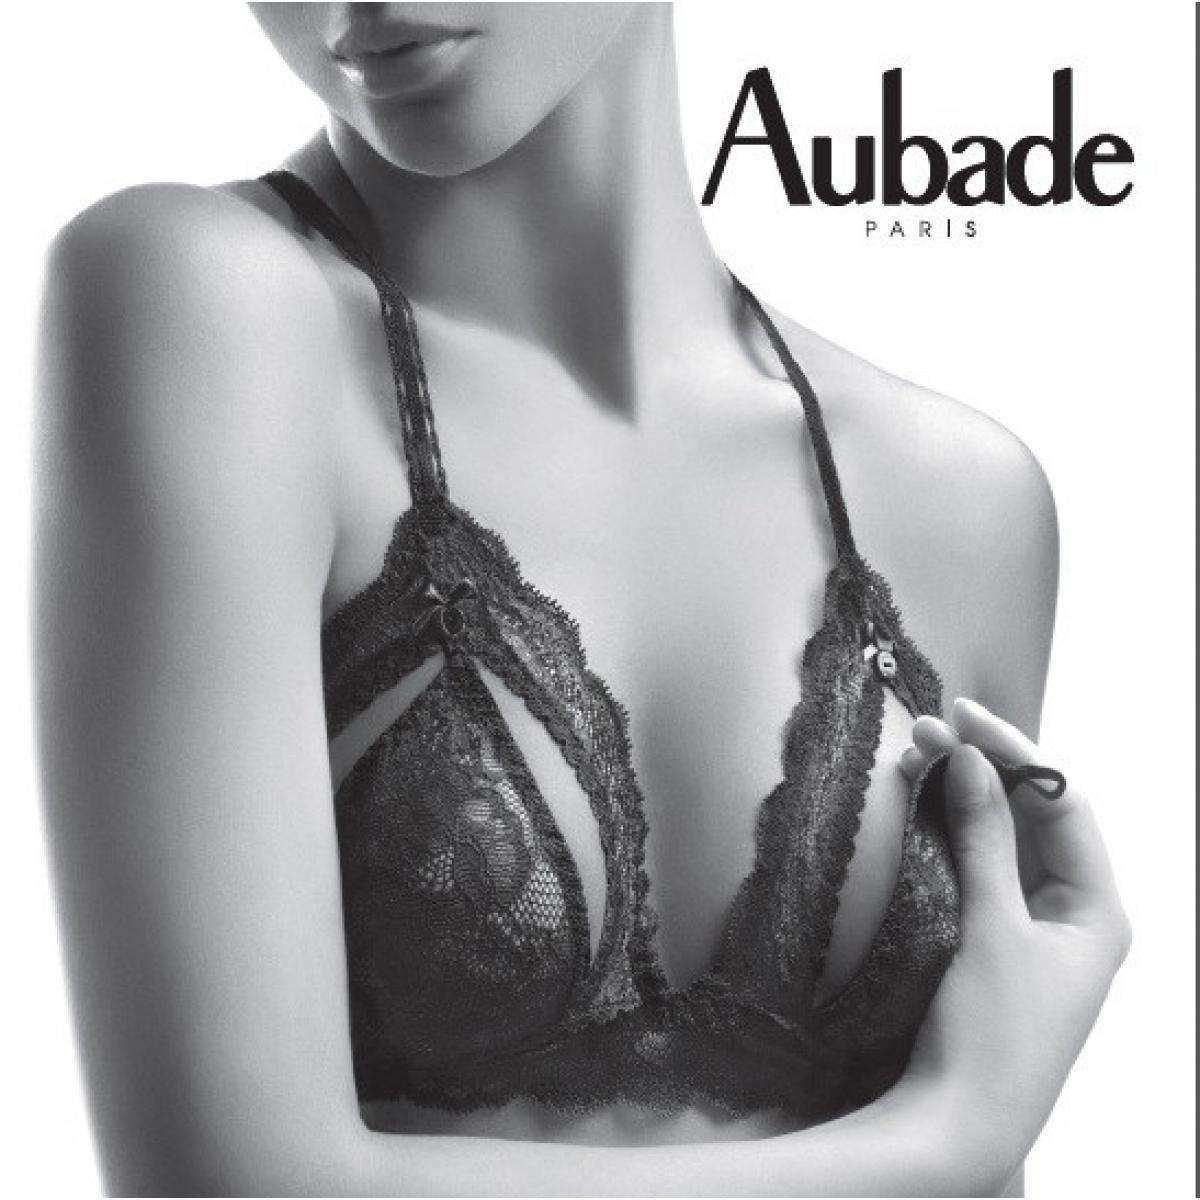 Soutien-gorge triangle Boite à Desir noir par Aubade 3e493ce85b0